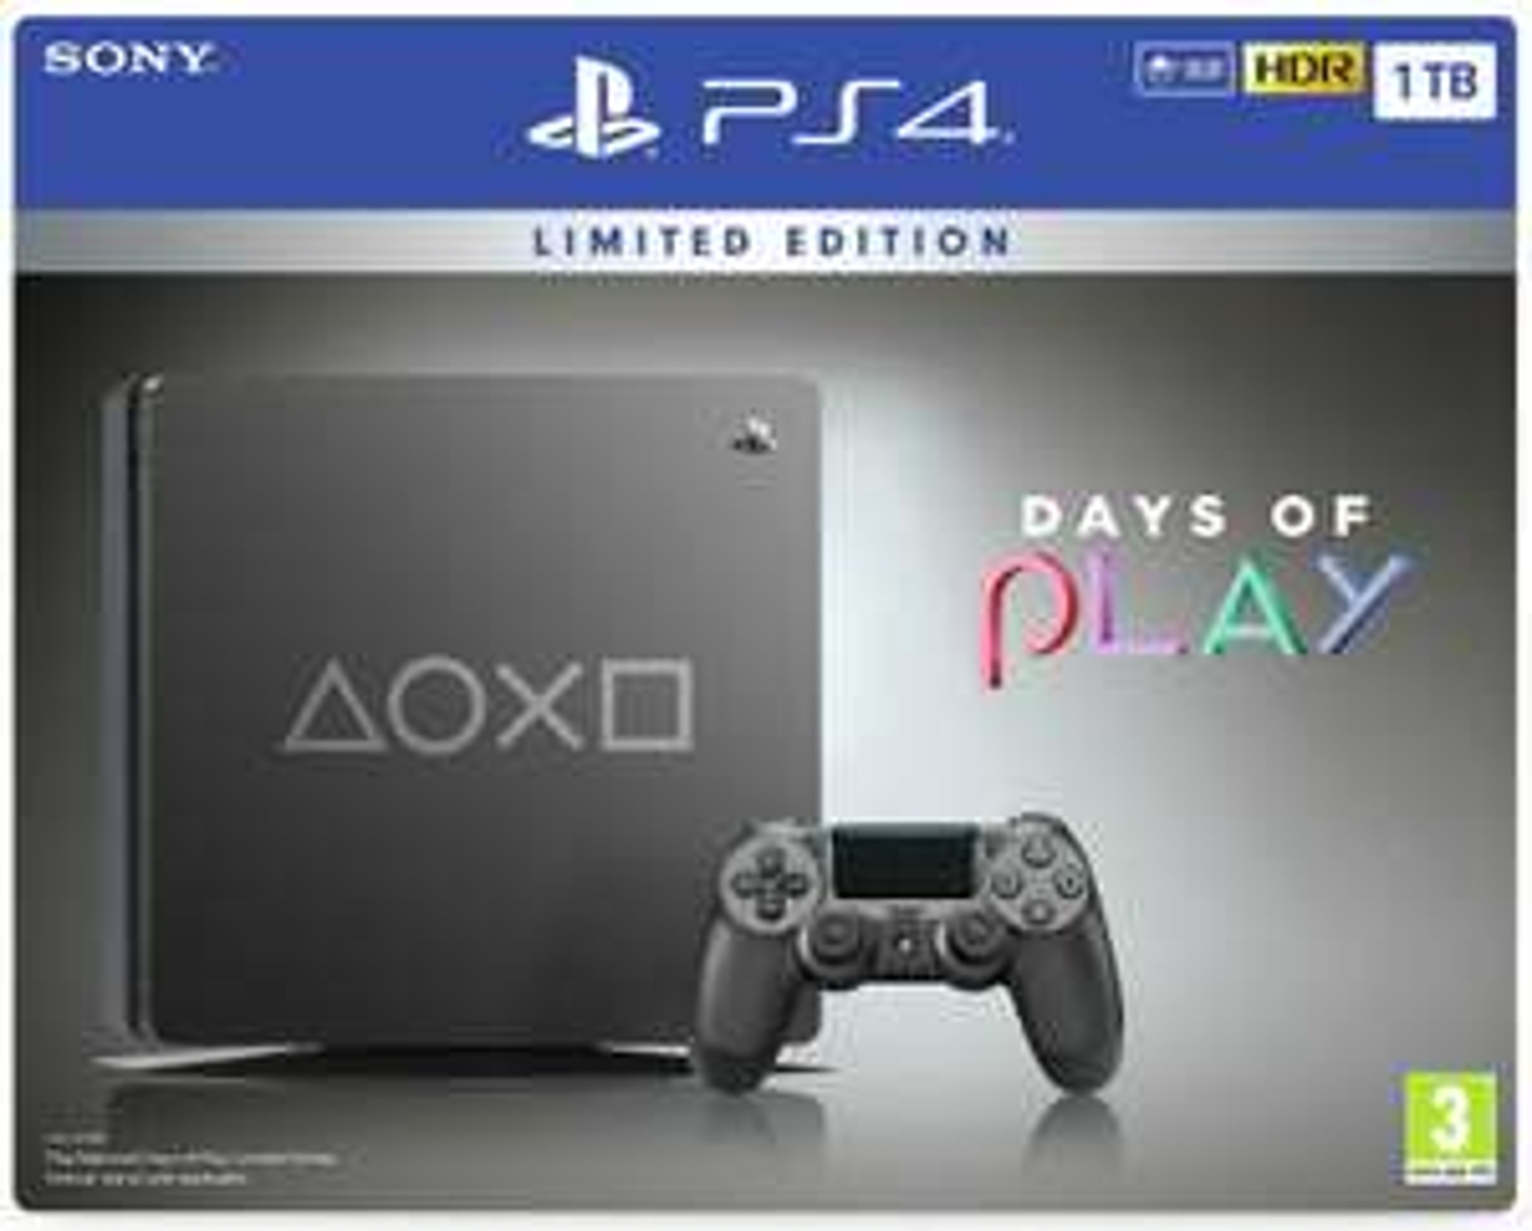 Sony Playstation PS4 1TB Days of Play Special Edition Console - Black £219.94 @ Argos eBay